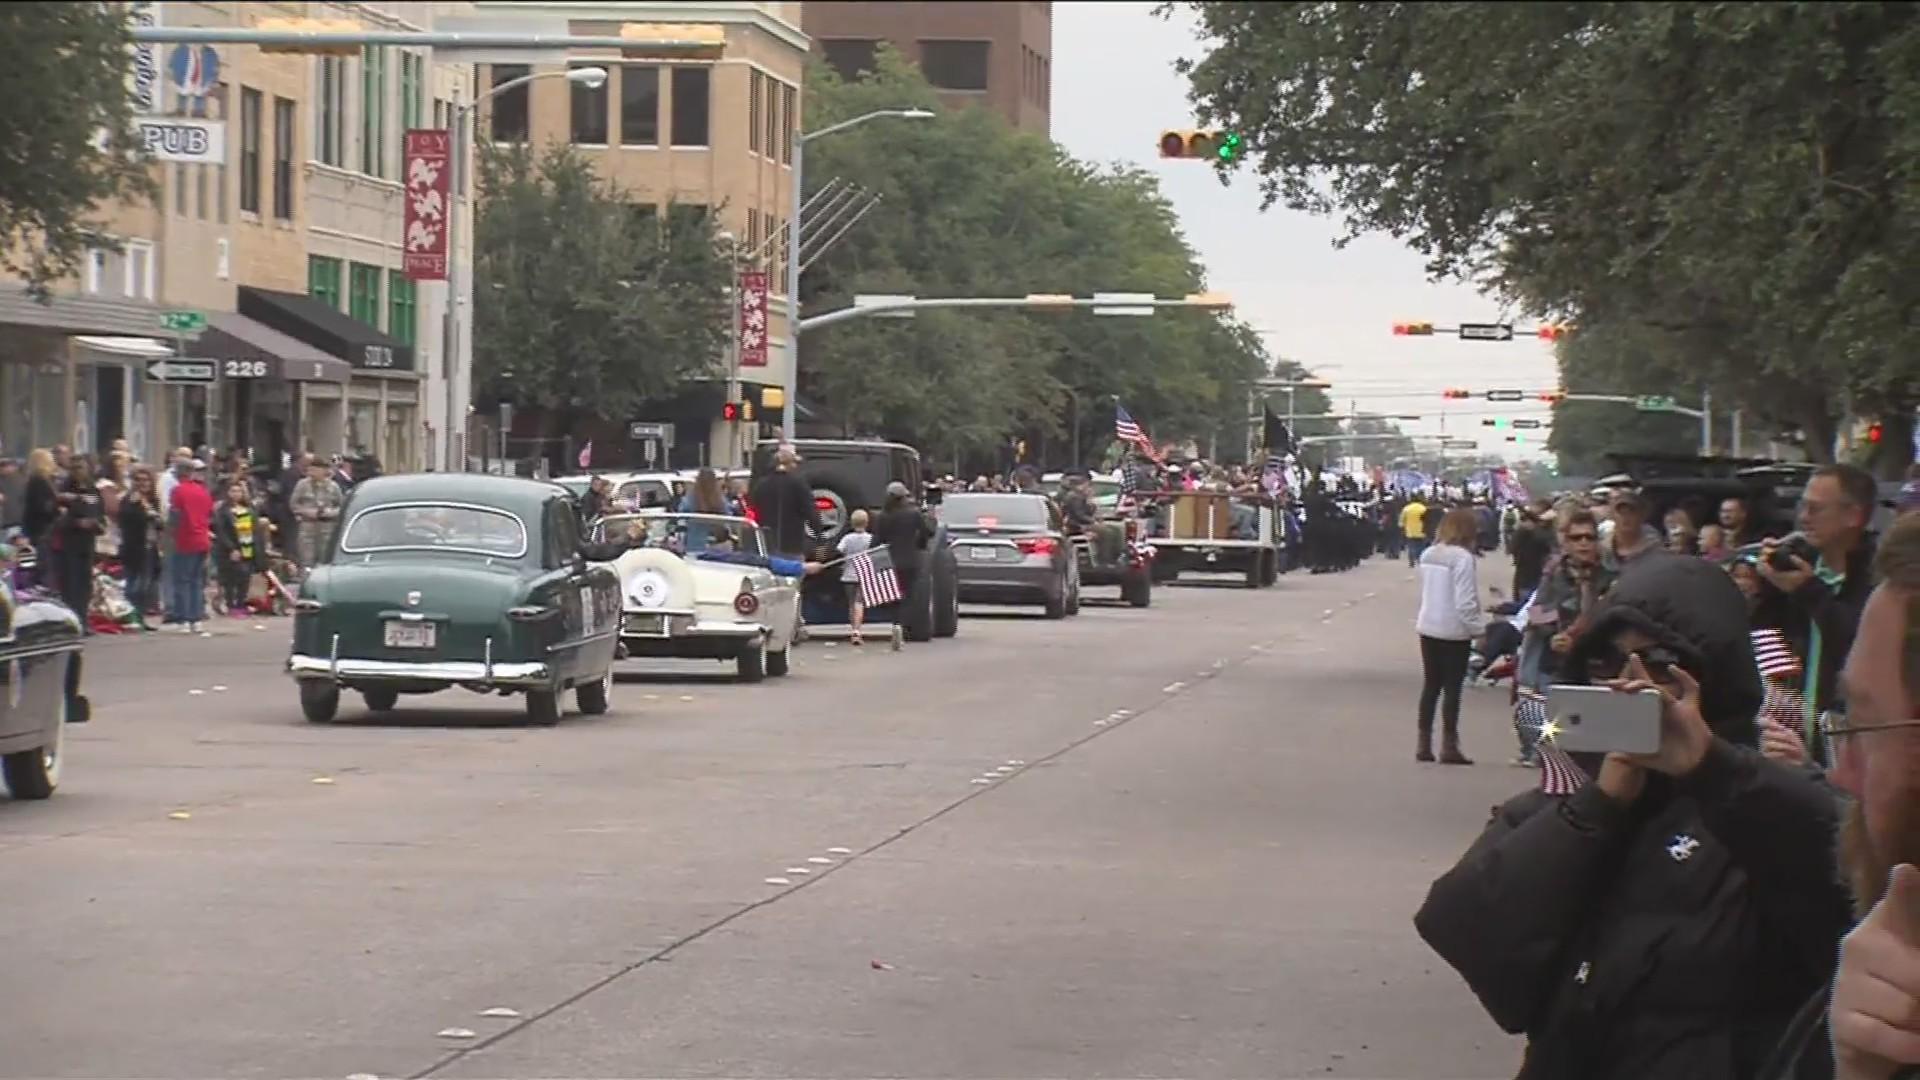 Veteran's Day Parade set for Saturday